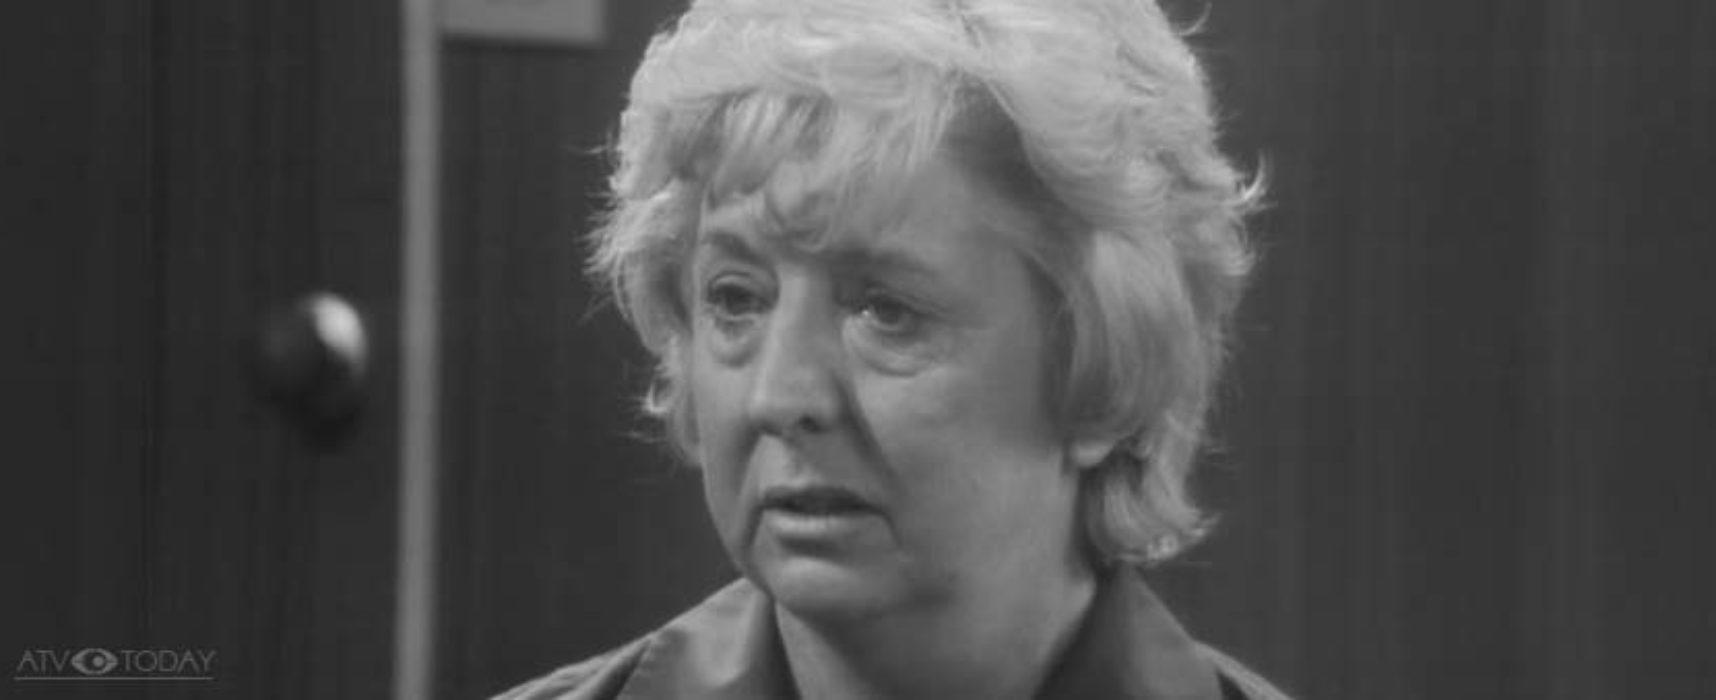 The Box star Lois Ramsey dies